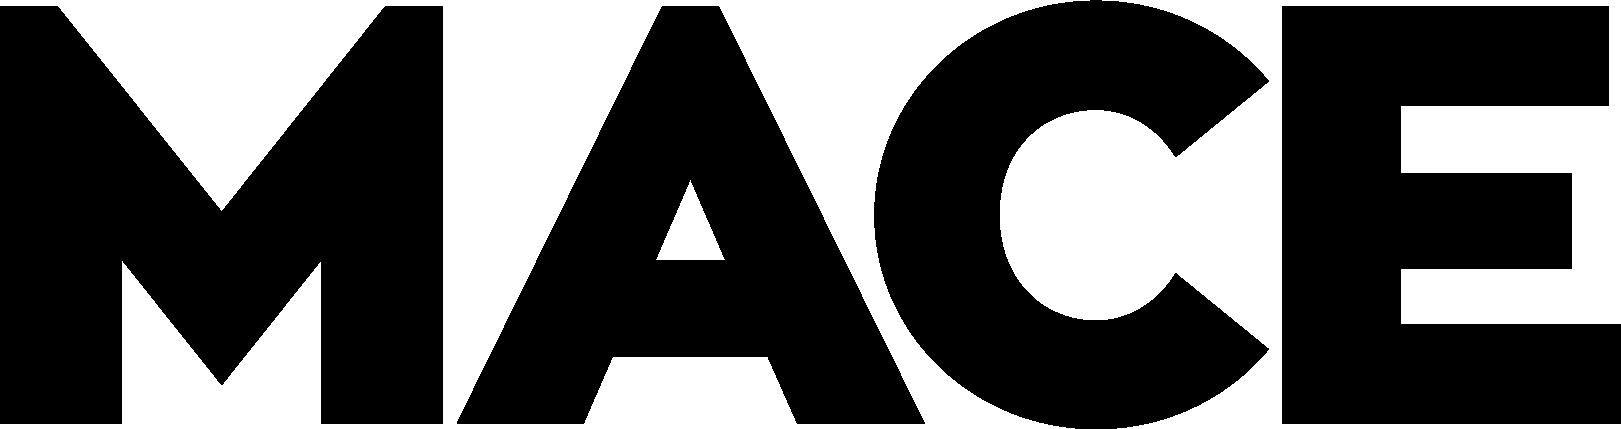 Black MACE logo